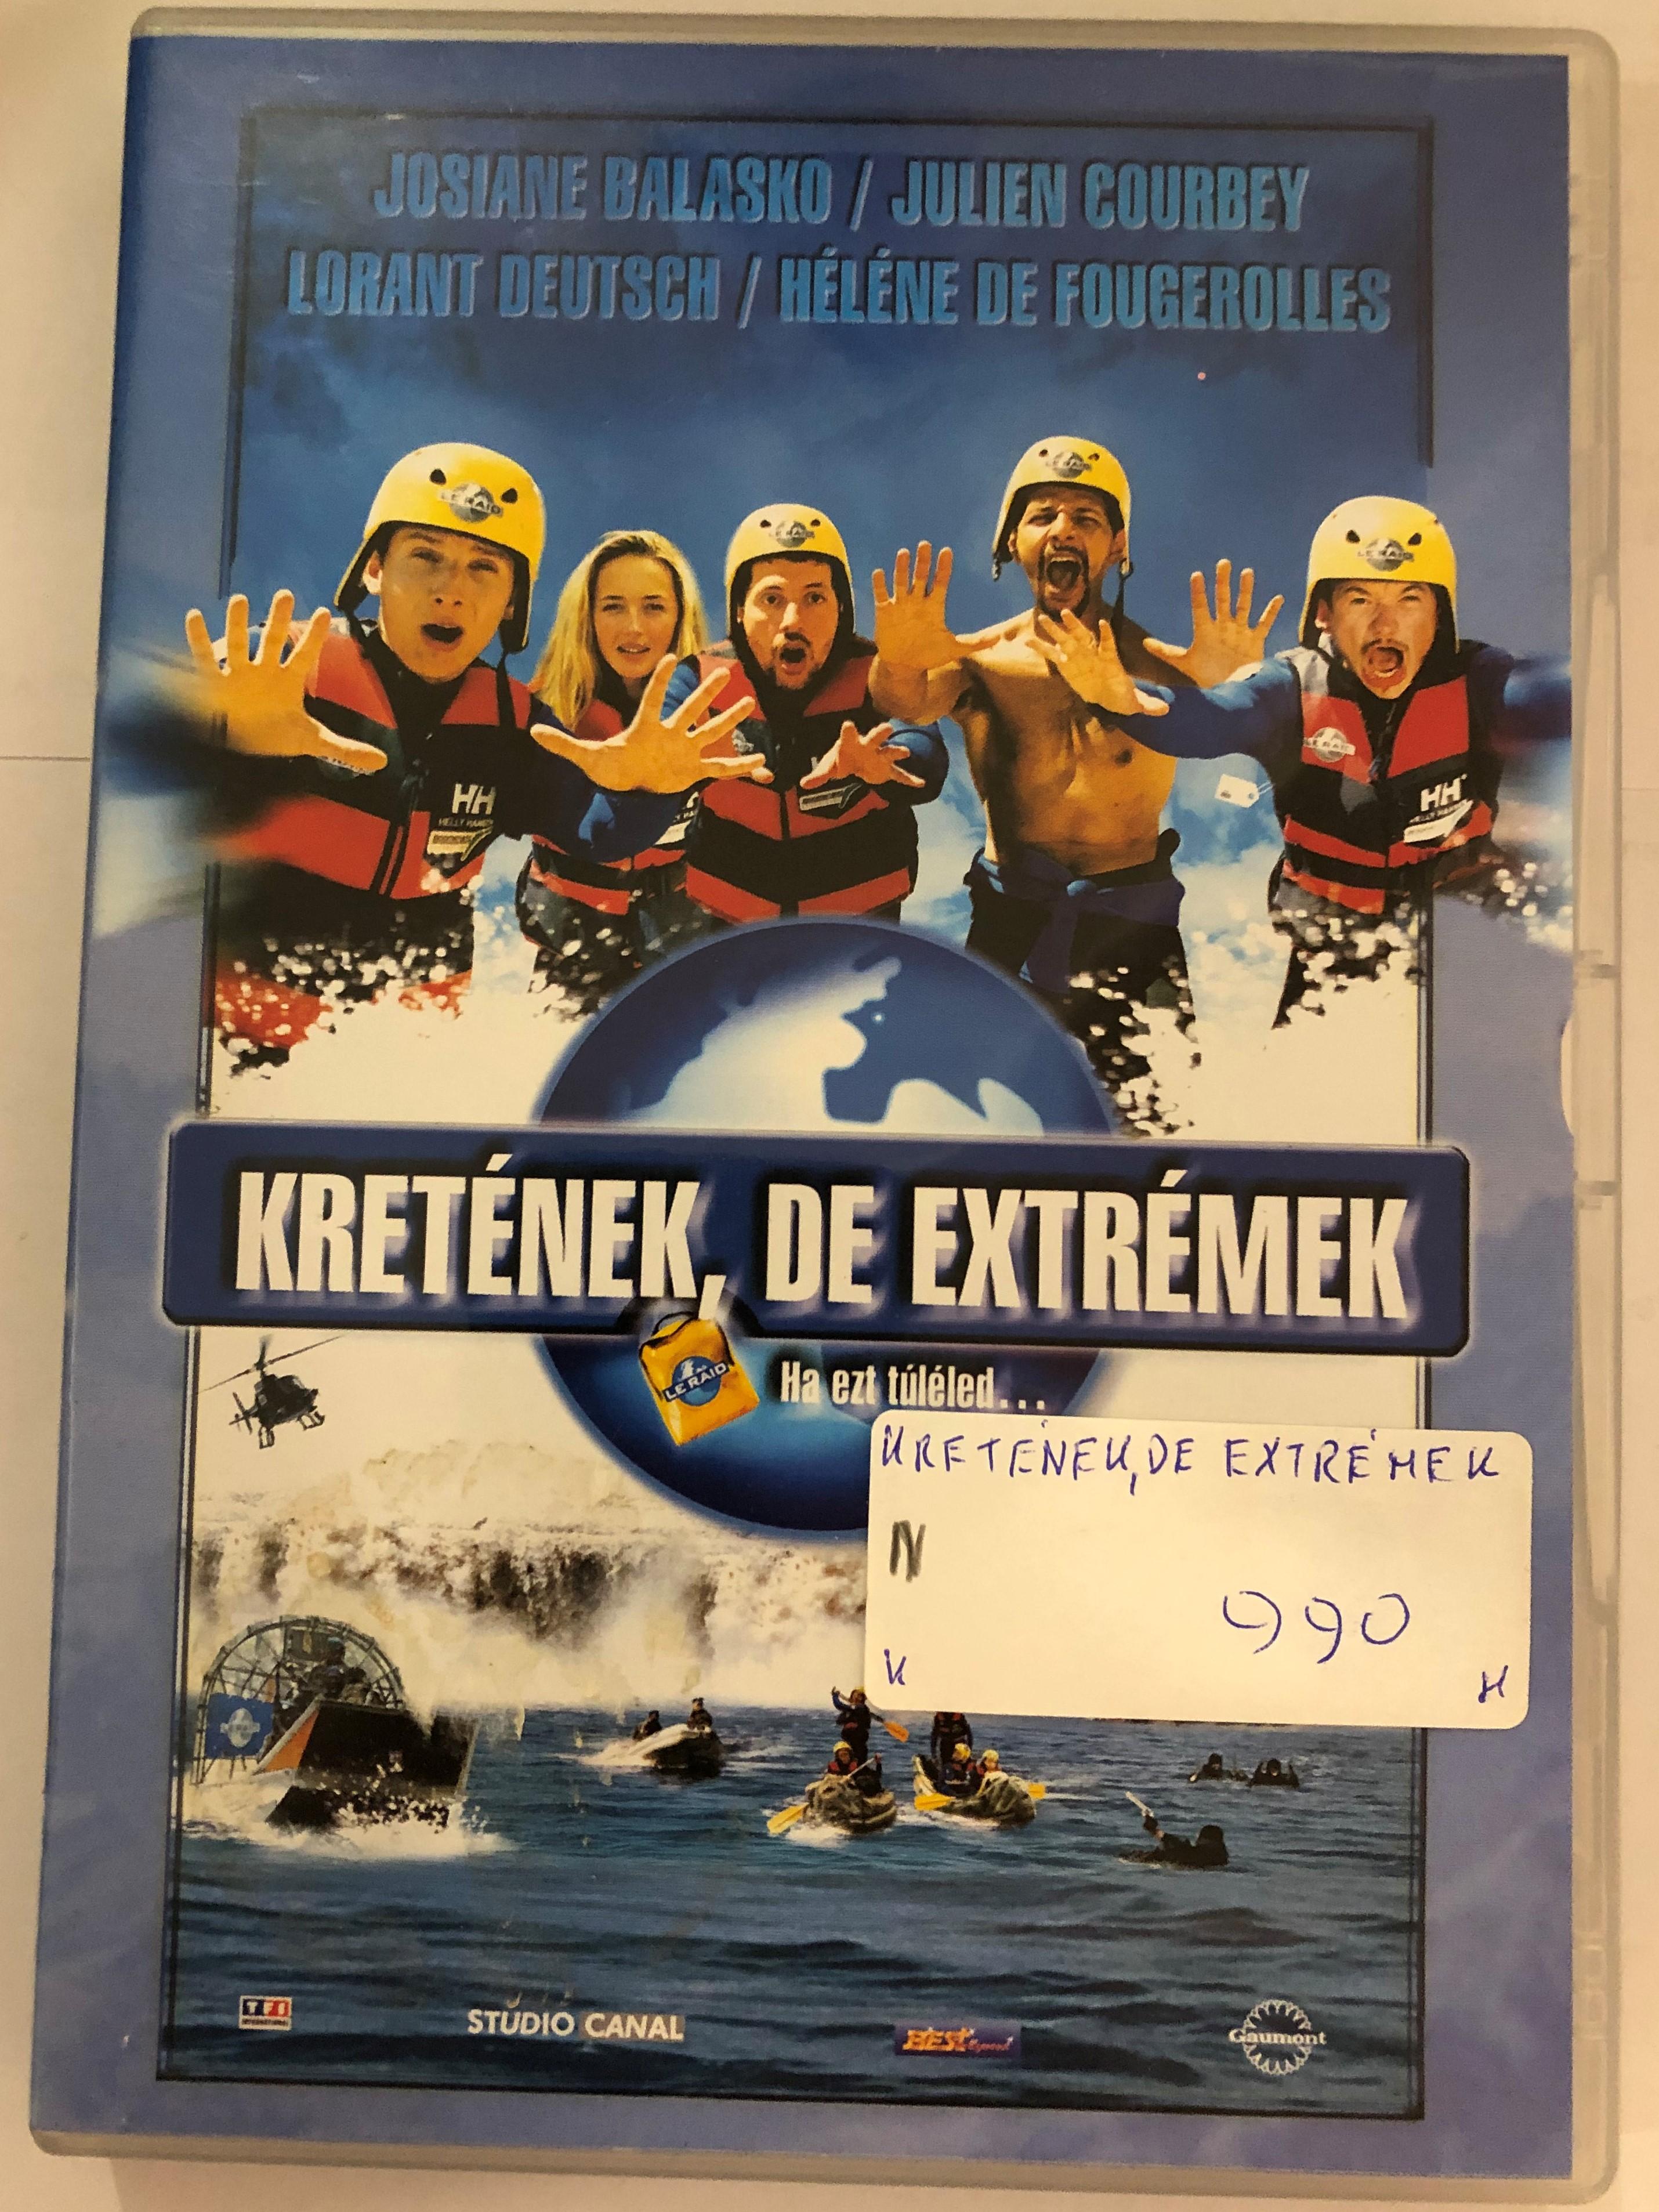 le-raid-dvd-2002-kret-nek-de-extr-mek-the-race-directed-by-djamel-bensalah-1.jpg